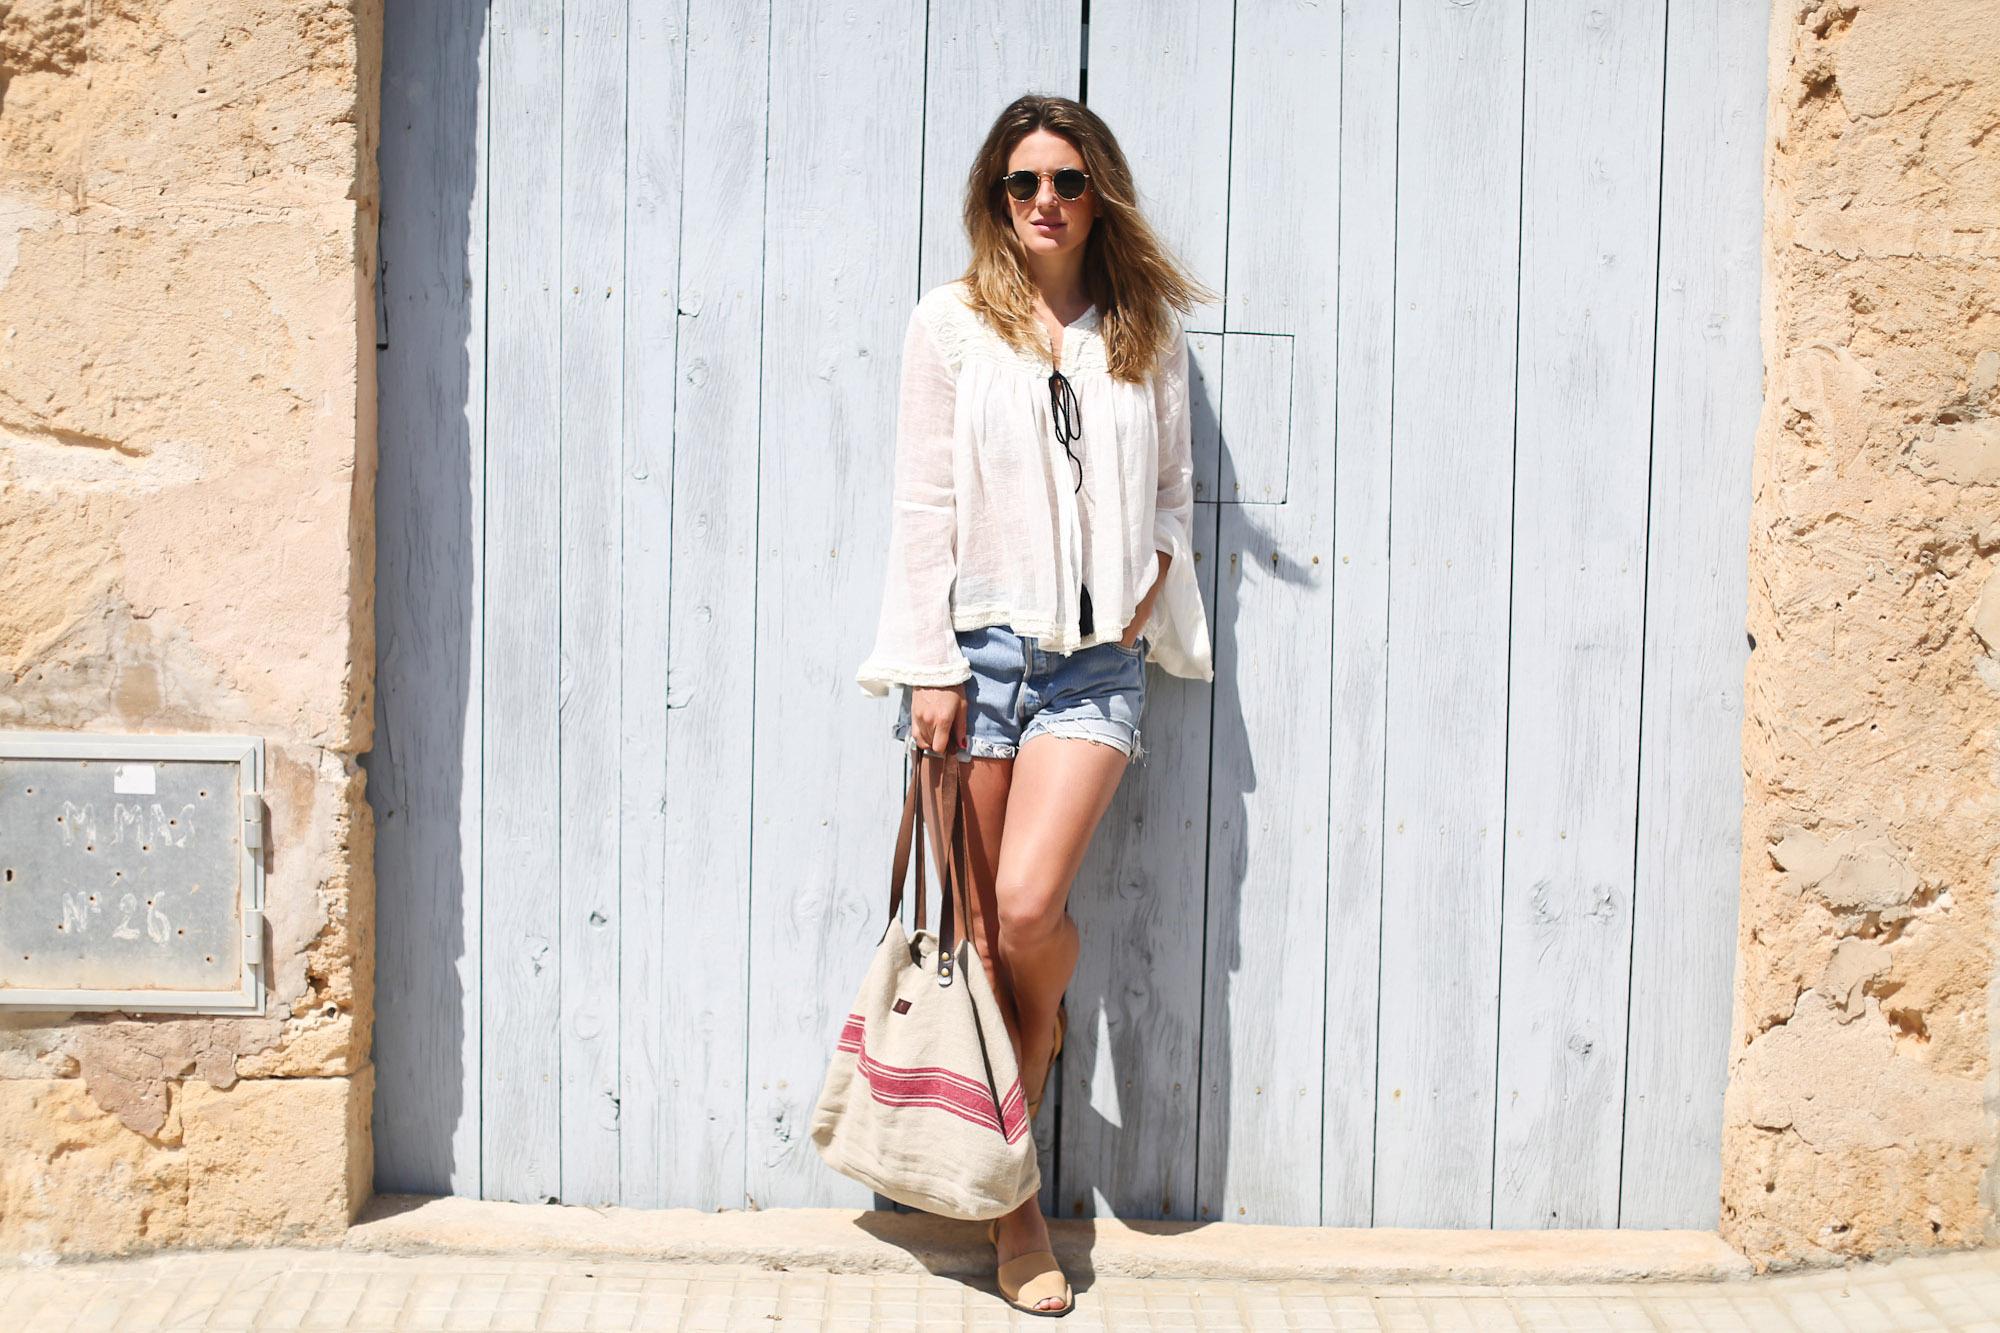 Clochet_streetstyle_zara_embroided_linen_kimonojacket_vintagelevis501shorts